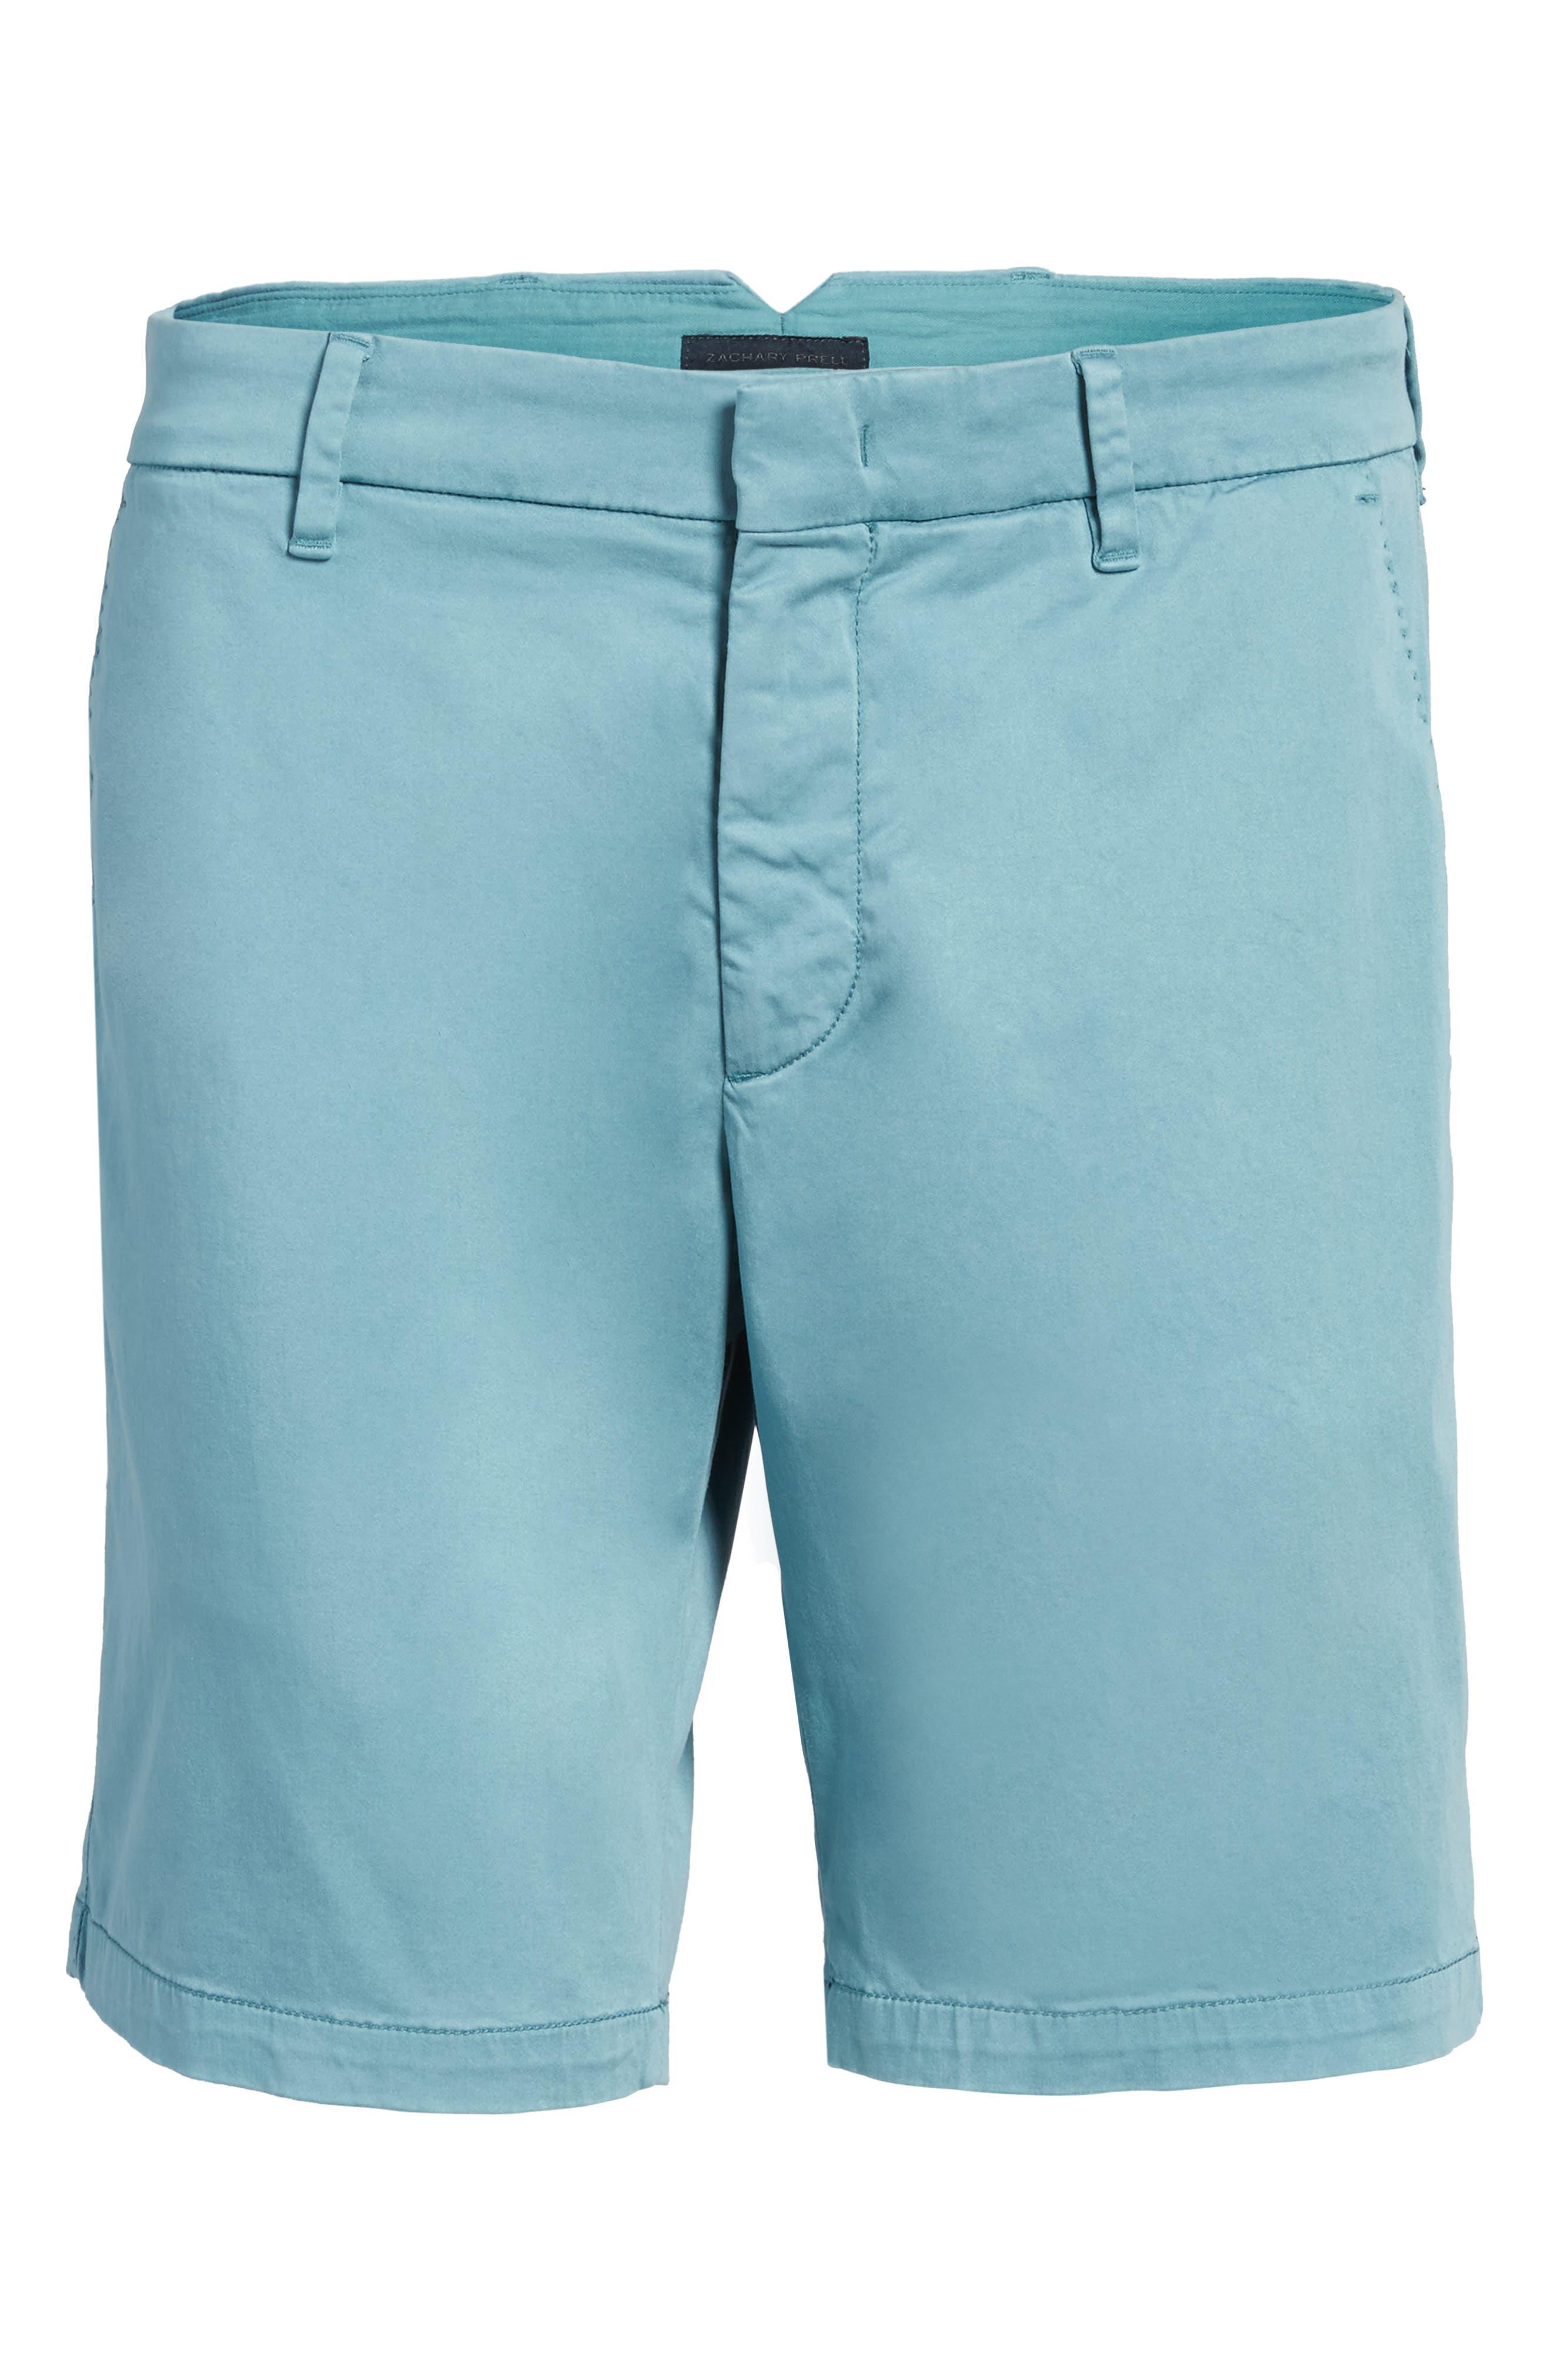 Catalpa Shorts,                             Alternate thumbnail 6, color,                             Teal